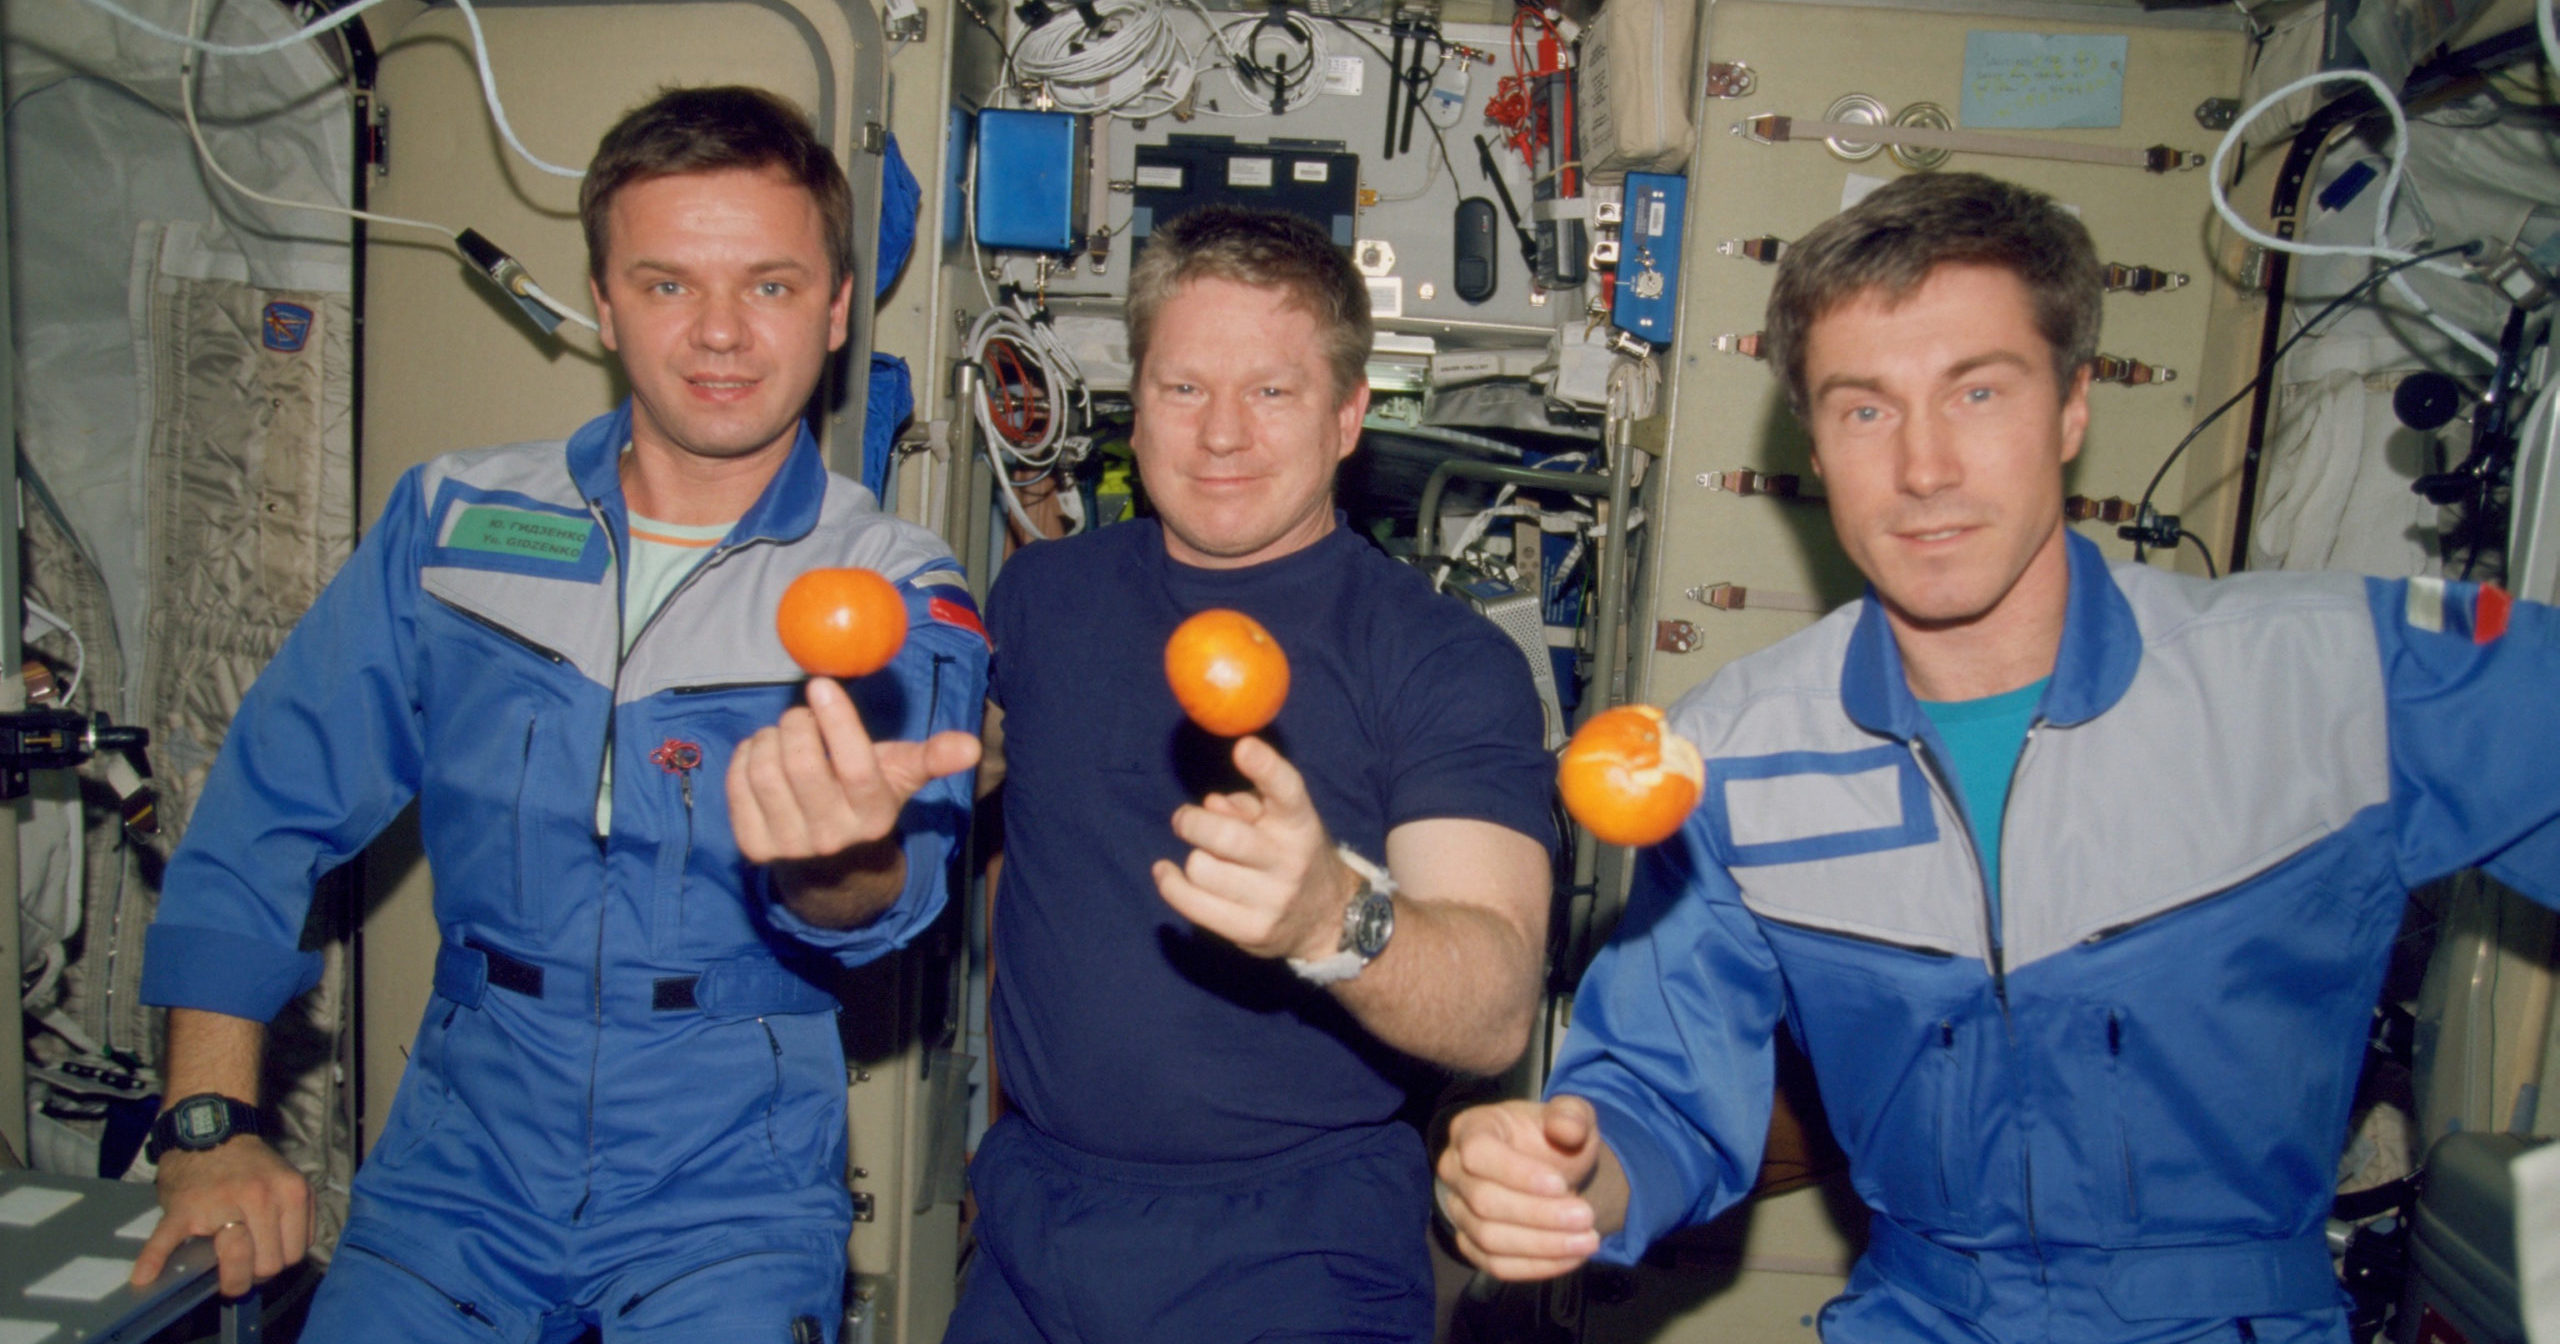 In this photo provided by NASA, Yuri Gidzenko, Bill Shepherd and Sergei Krikalev pose on board the International Space Station on Dec. 4, 2000.